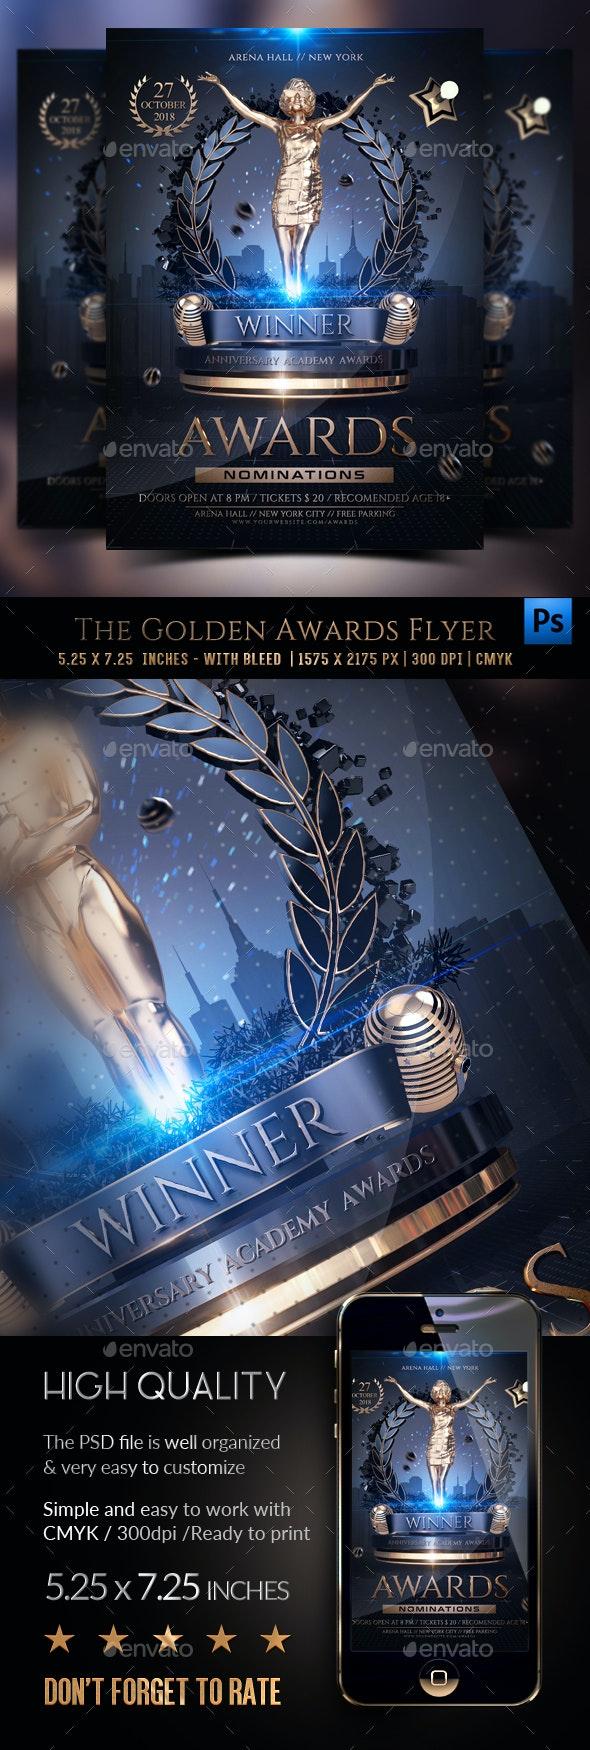 The Golden Awards Flyer Template